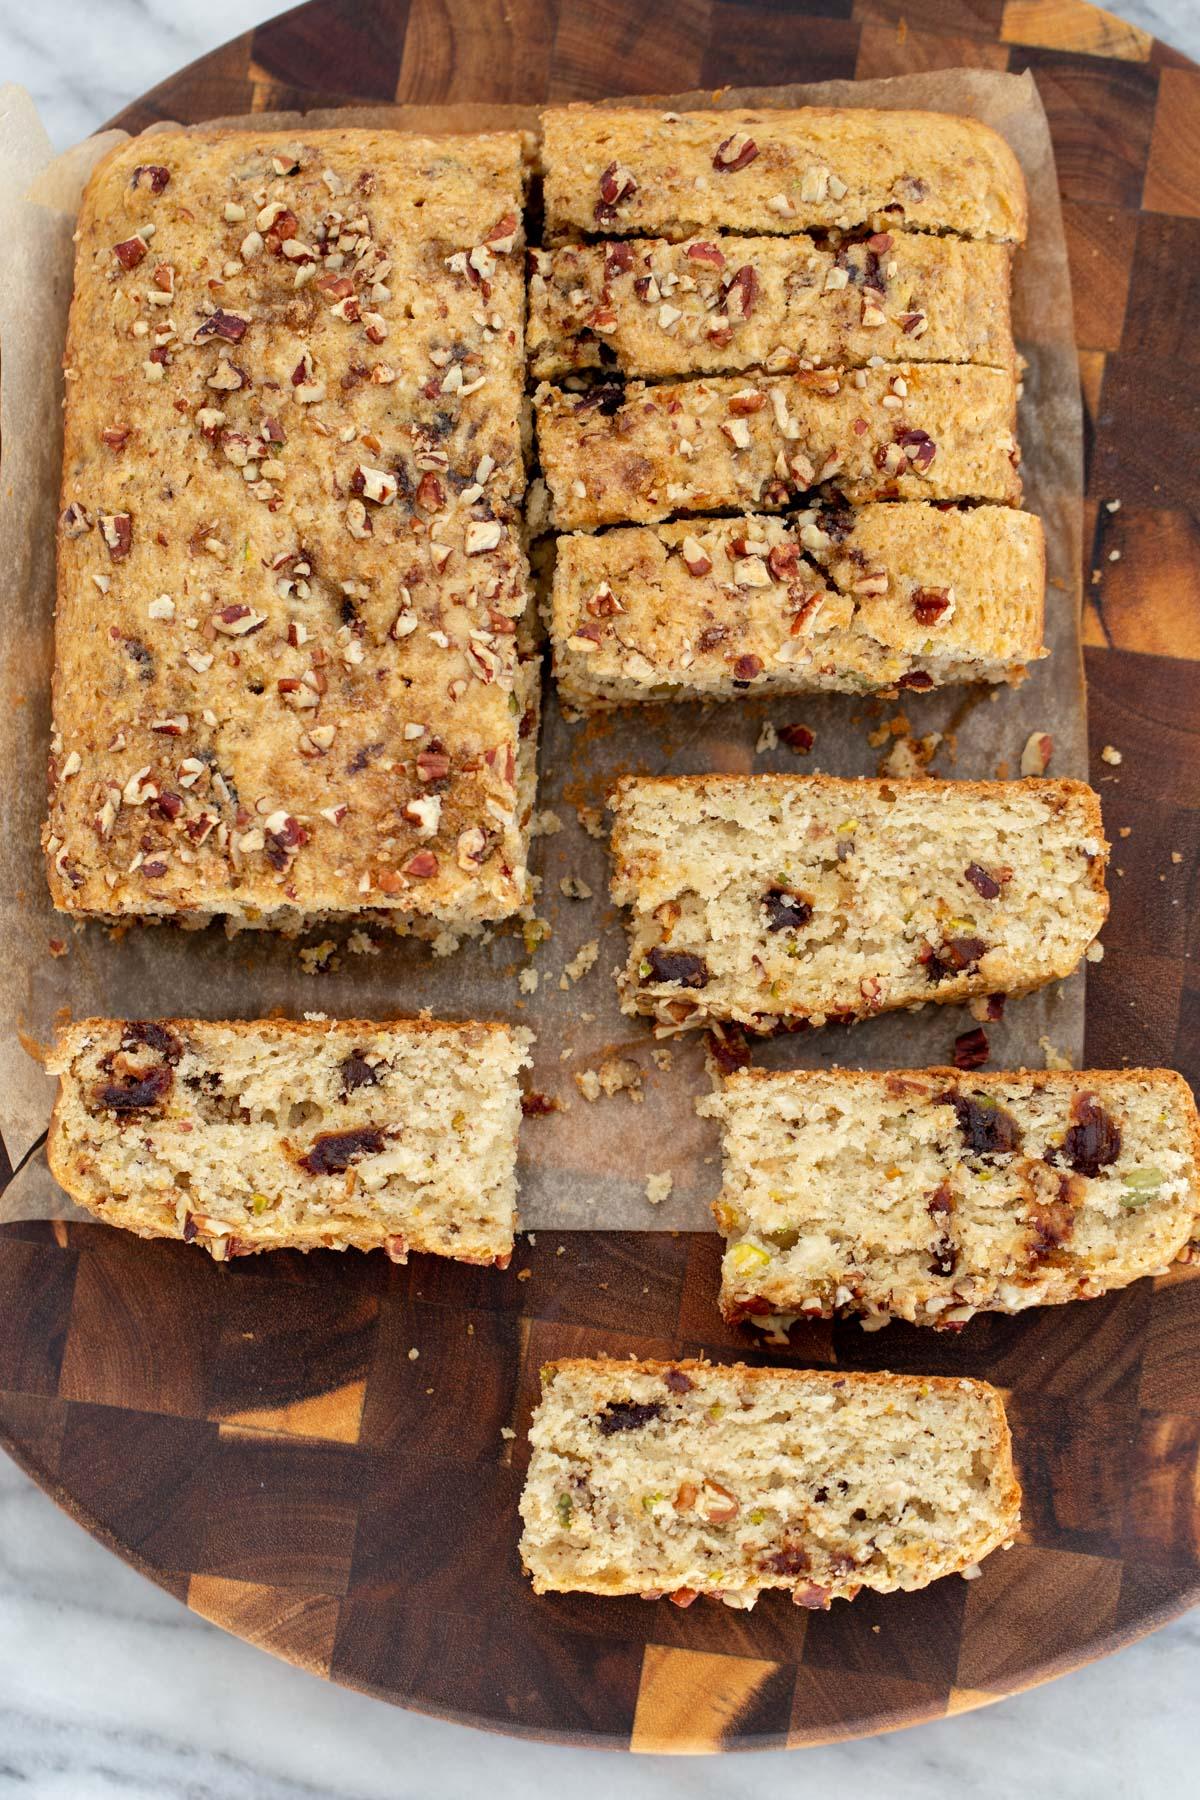 vegan date nut cake cut on a wooden chopping board